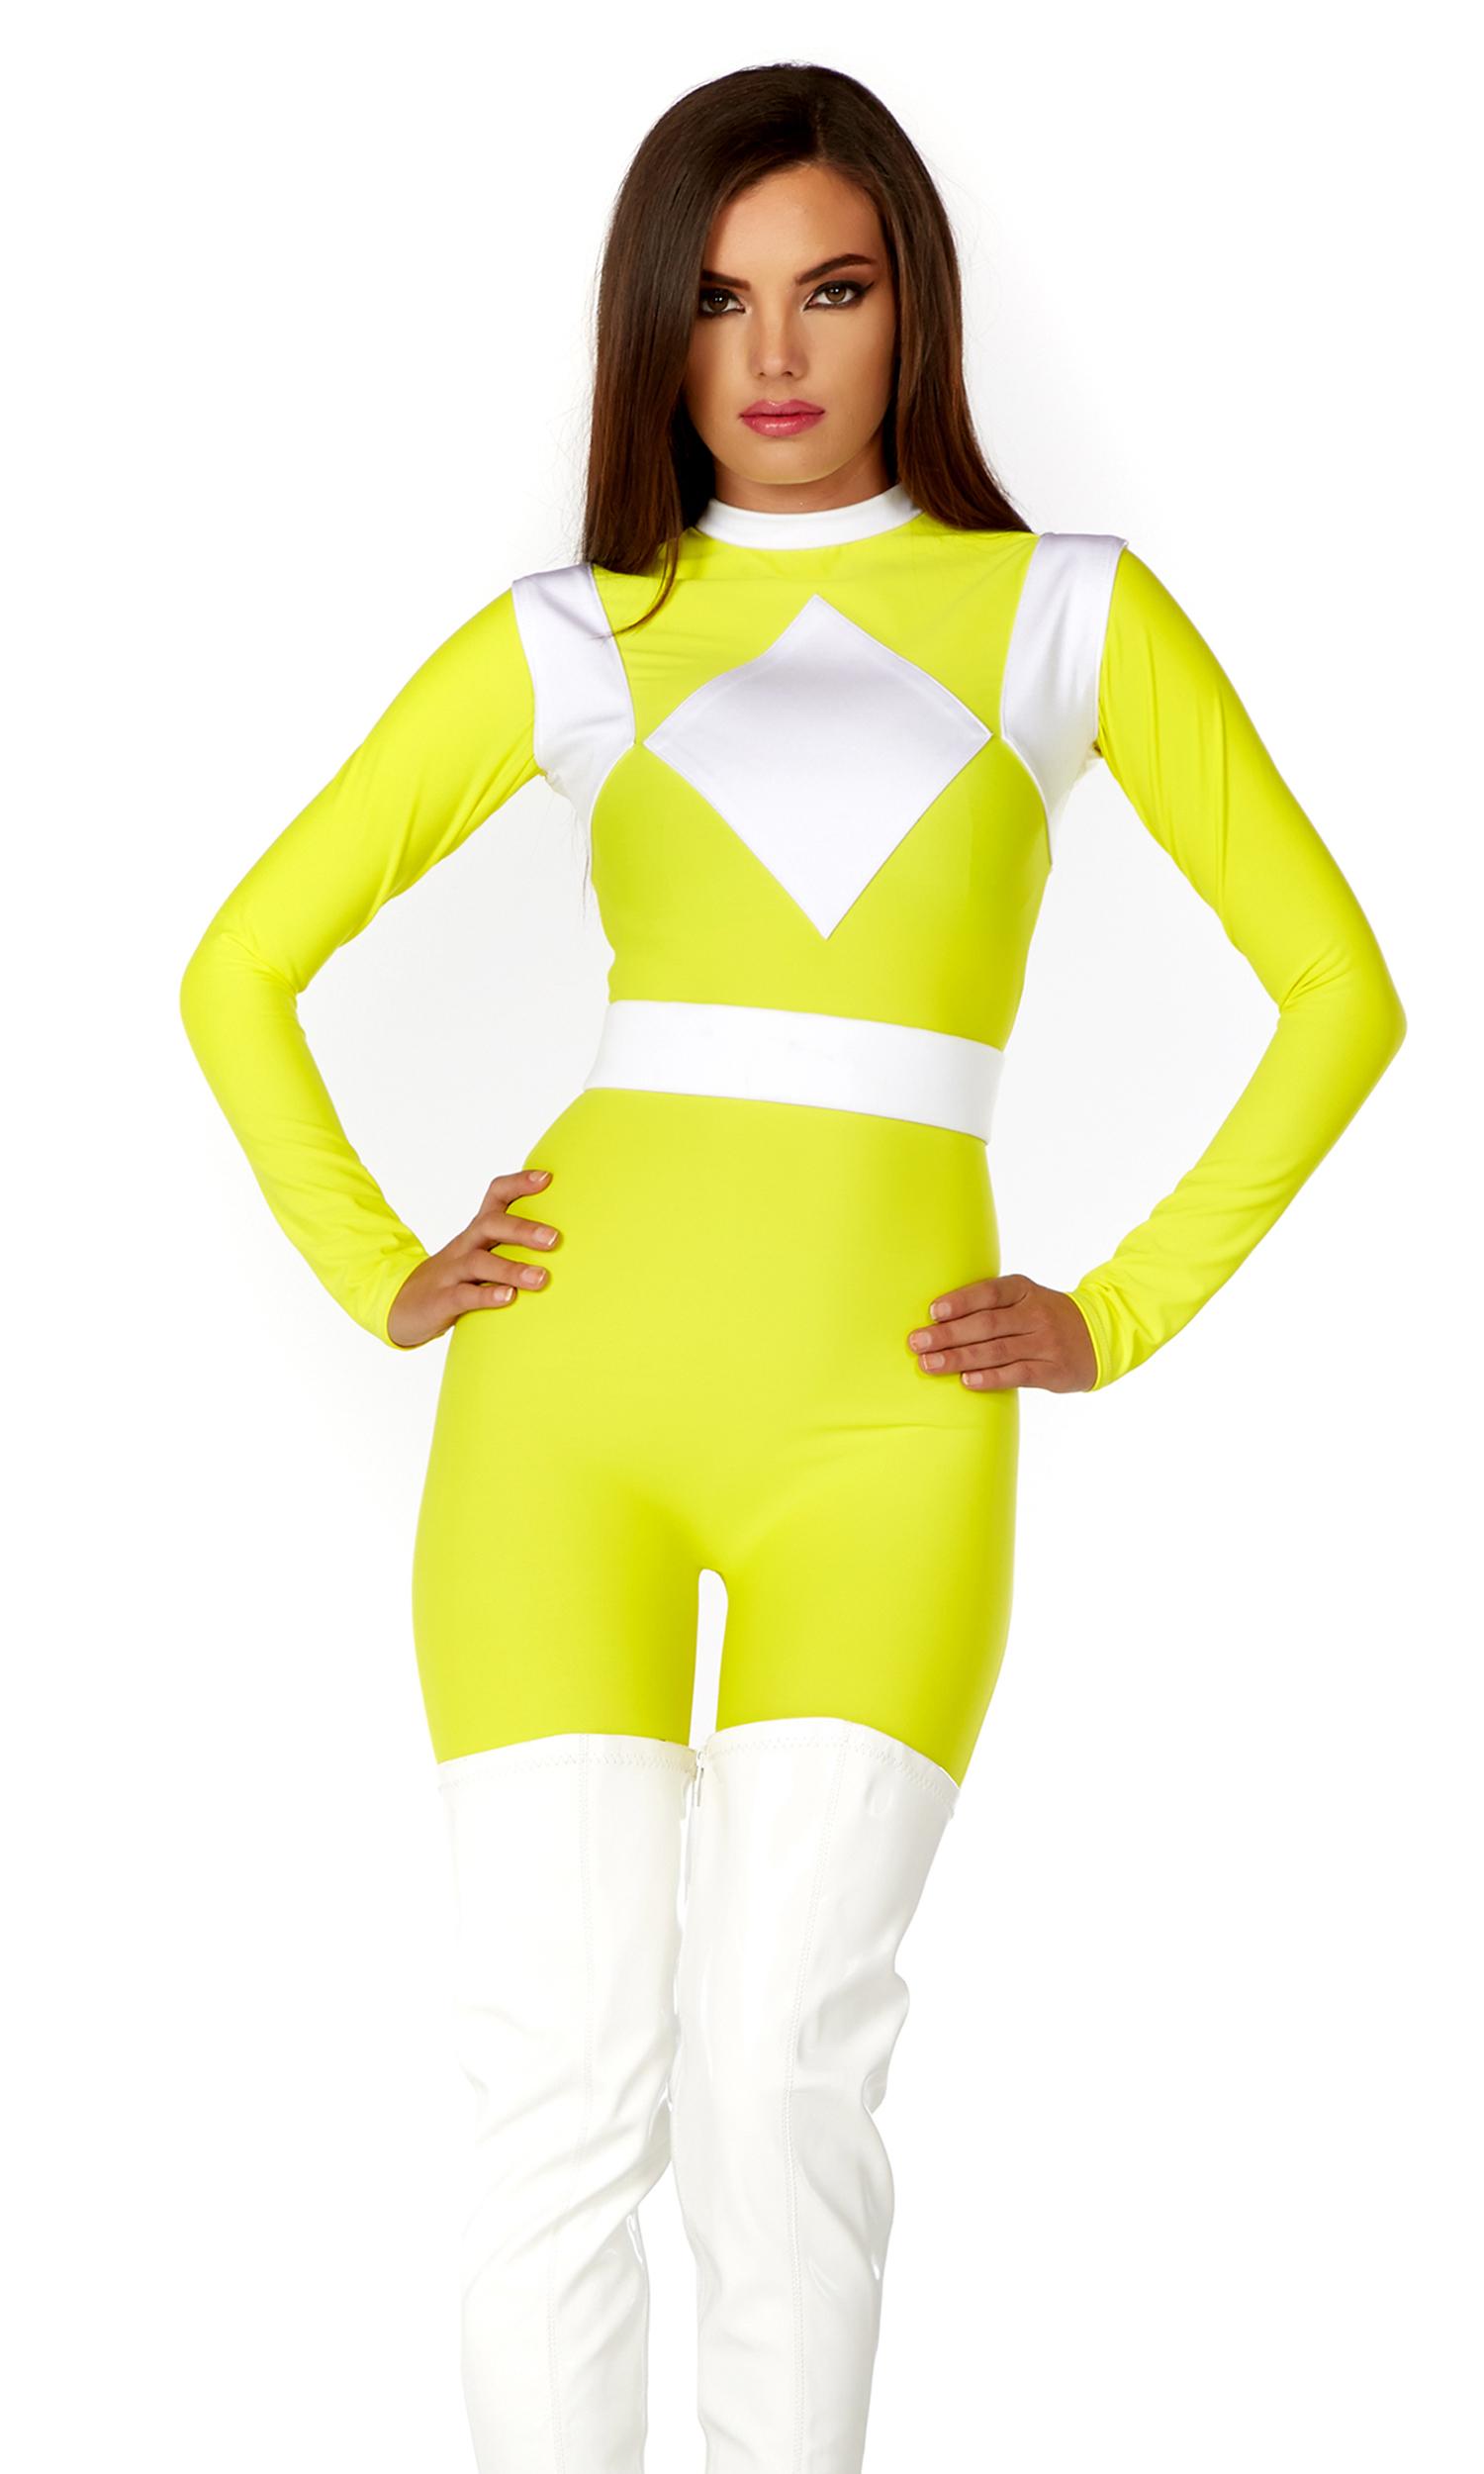 Sexy Superhero Costumes - Womenu0027s Superhero Costumes - Sexy Supervillain Costumes  sc 1 st  ForPlay Catalog & Dynamic Sexy Superhero Costume